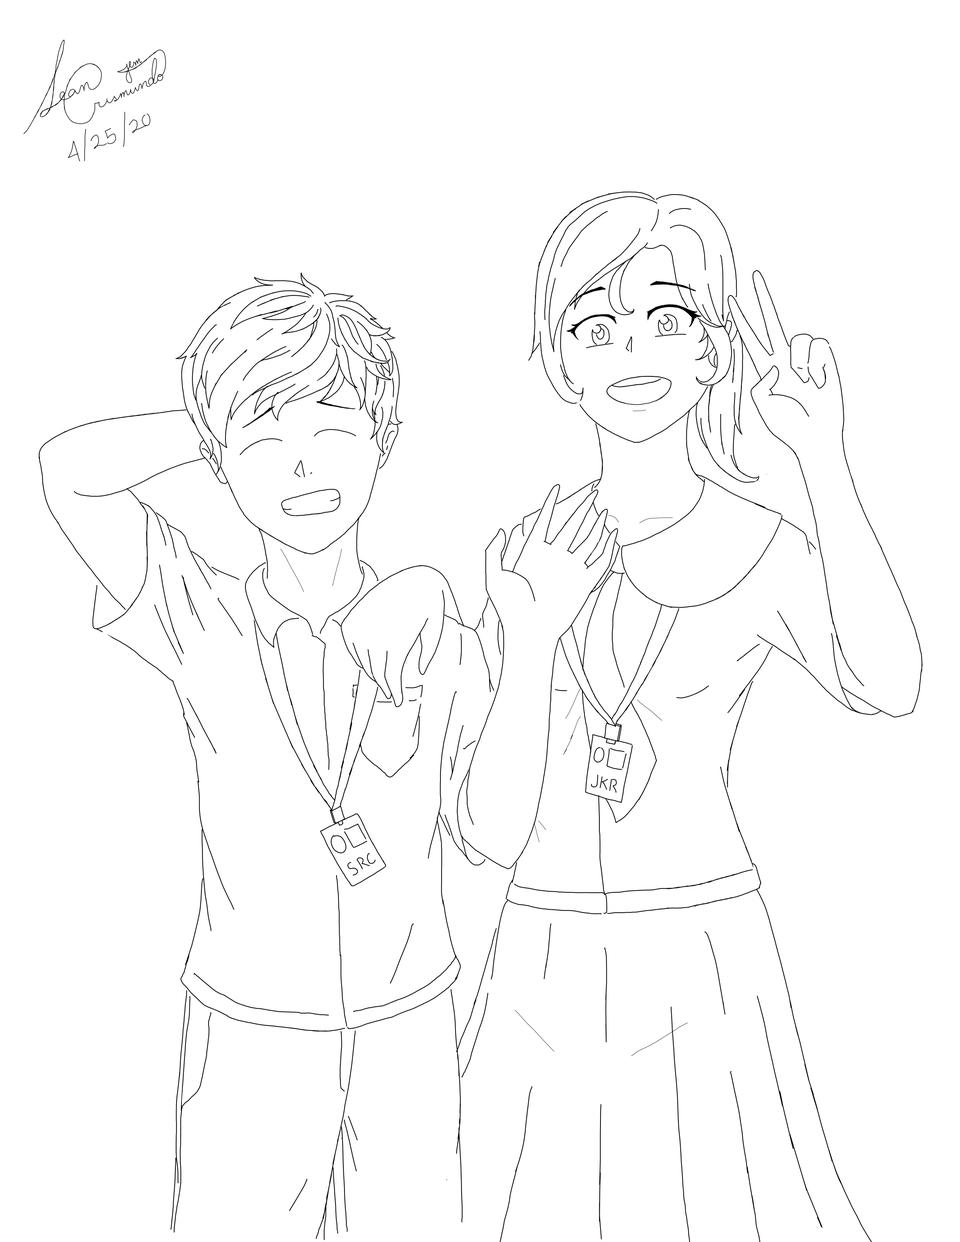 Hight doesn't matter in Love Illust of Potato_Price romance school Original_Illustration_Contest line_art Crush girl love art sketch boy anime